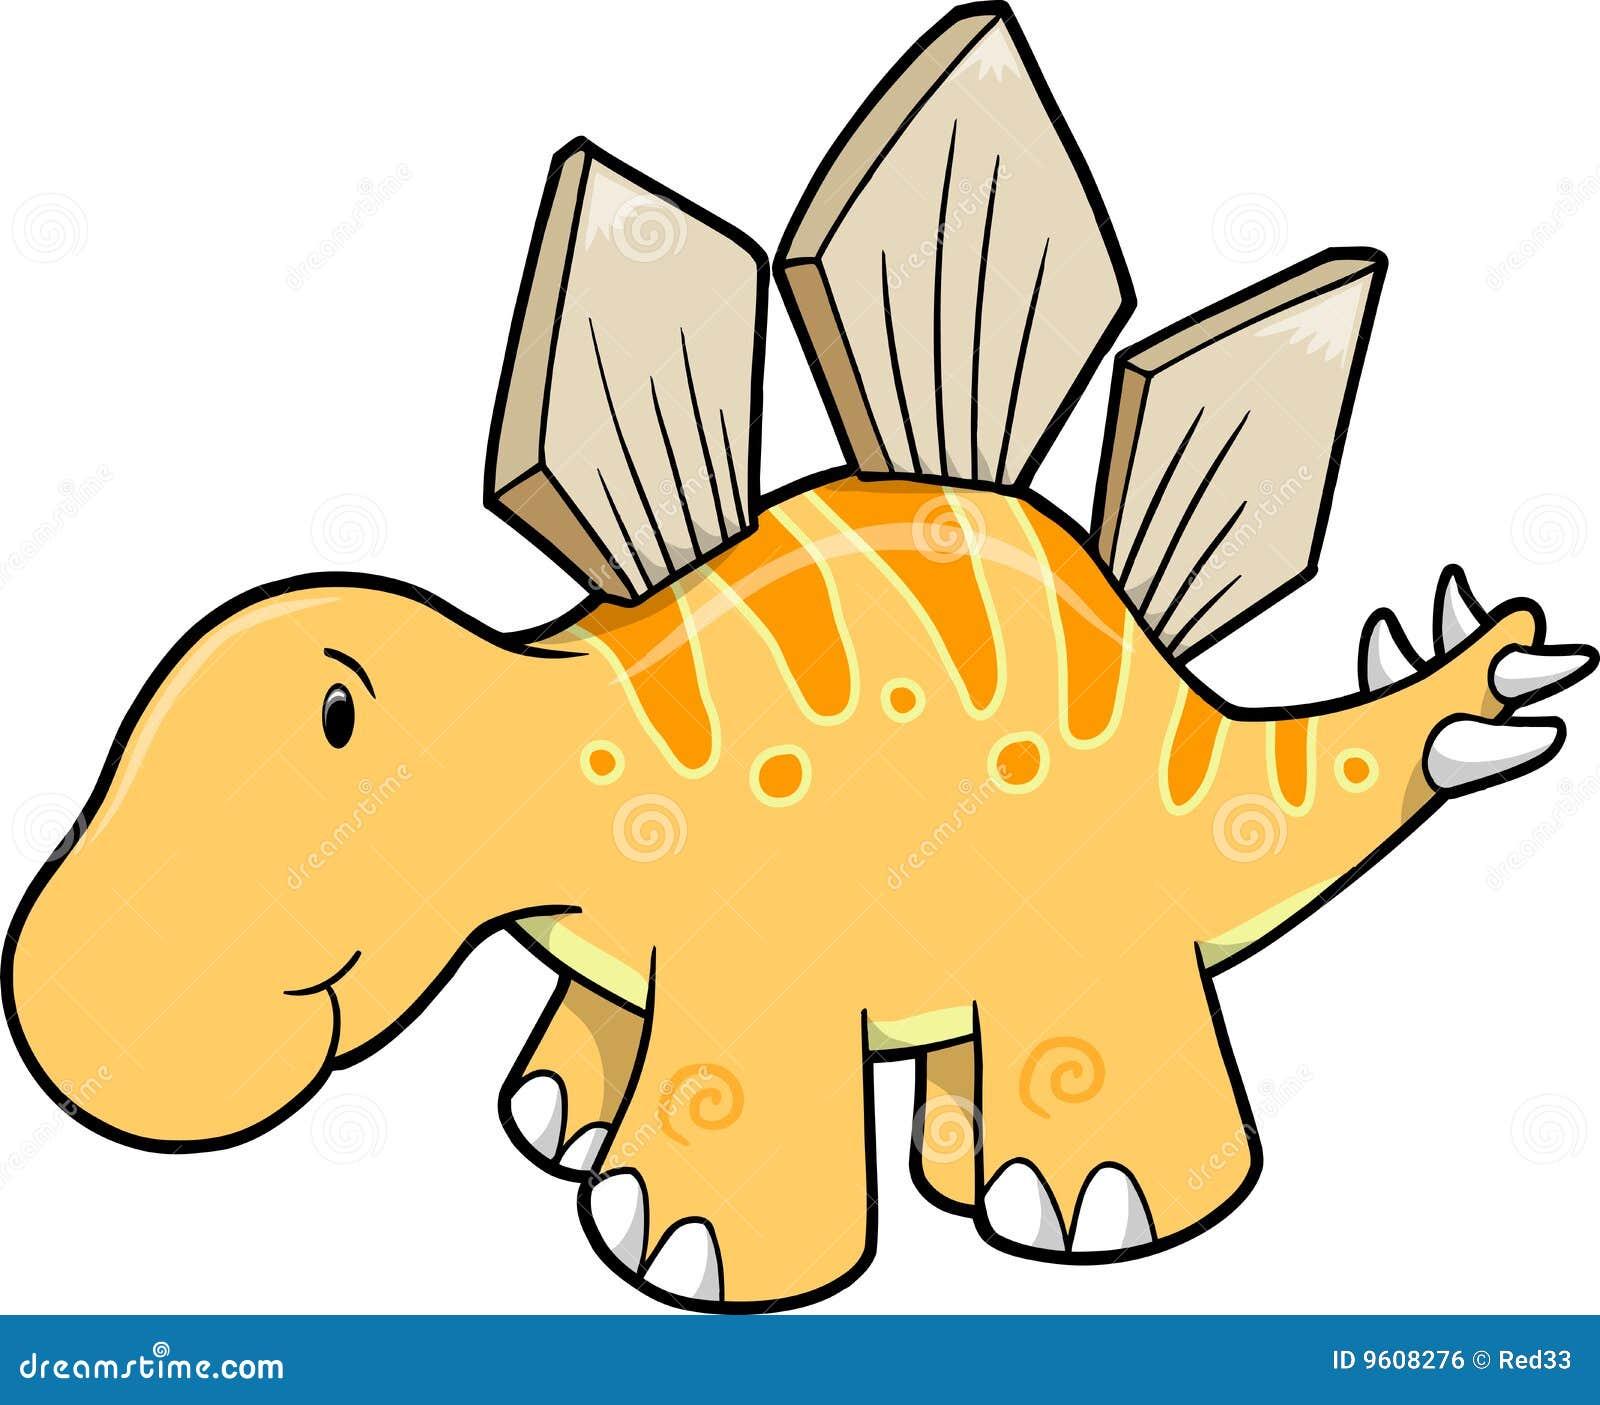 Uncategorized Cute Stegosaurus cute stegosaurus vector illustration stock image 9608276 illustration